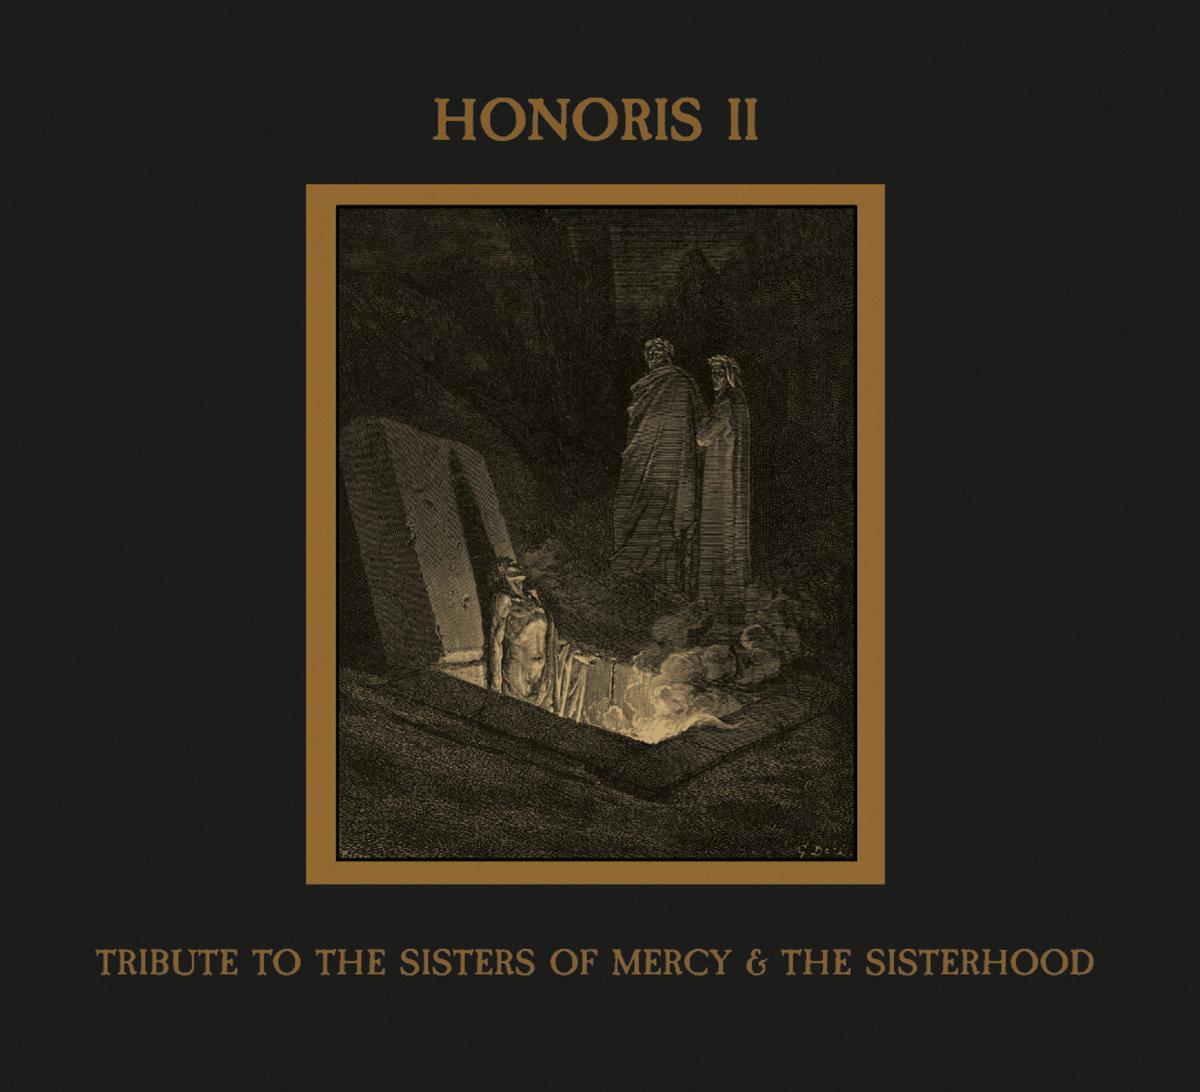 News – Honoris II Tribute To The Sisters Of Mercy & The Sisterhood